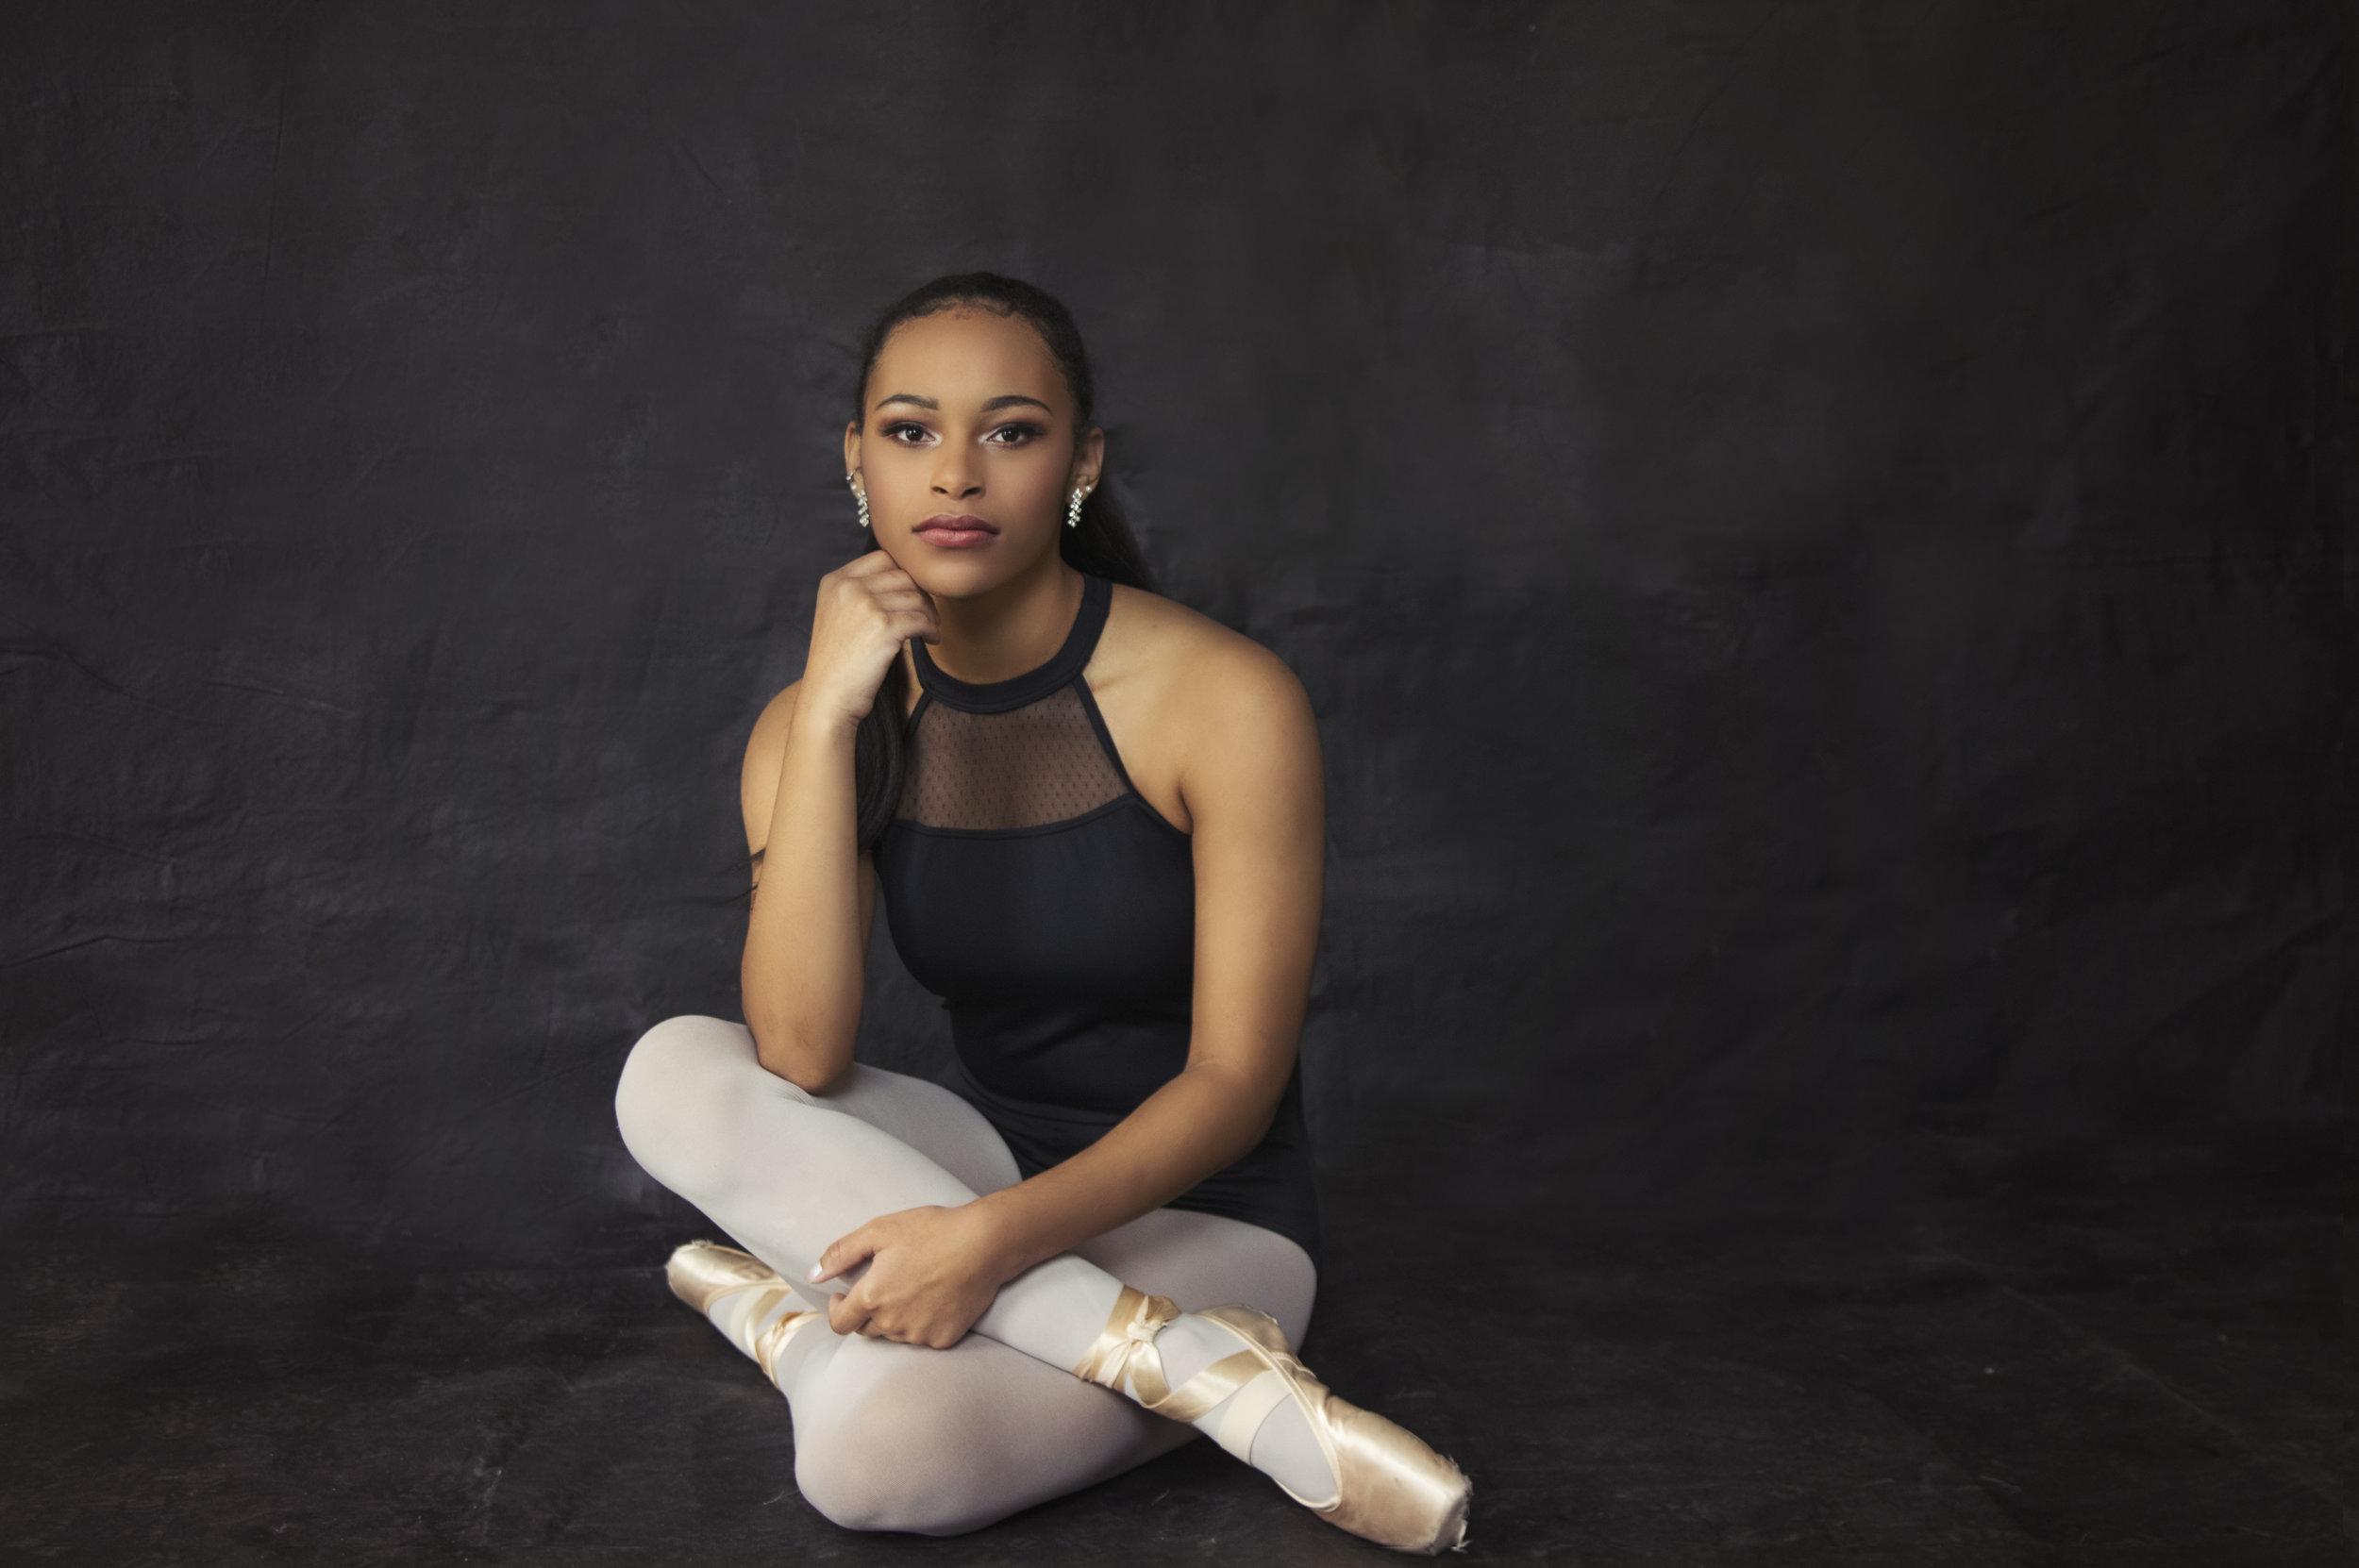 Heirloom Portrait of a Ballerina